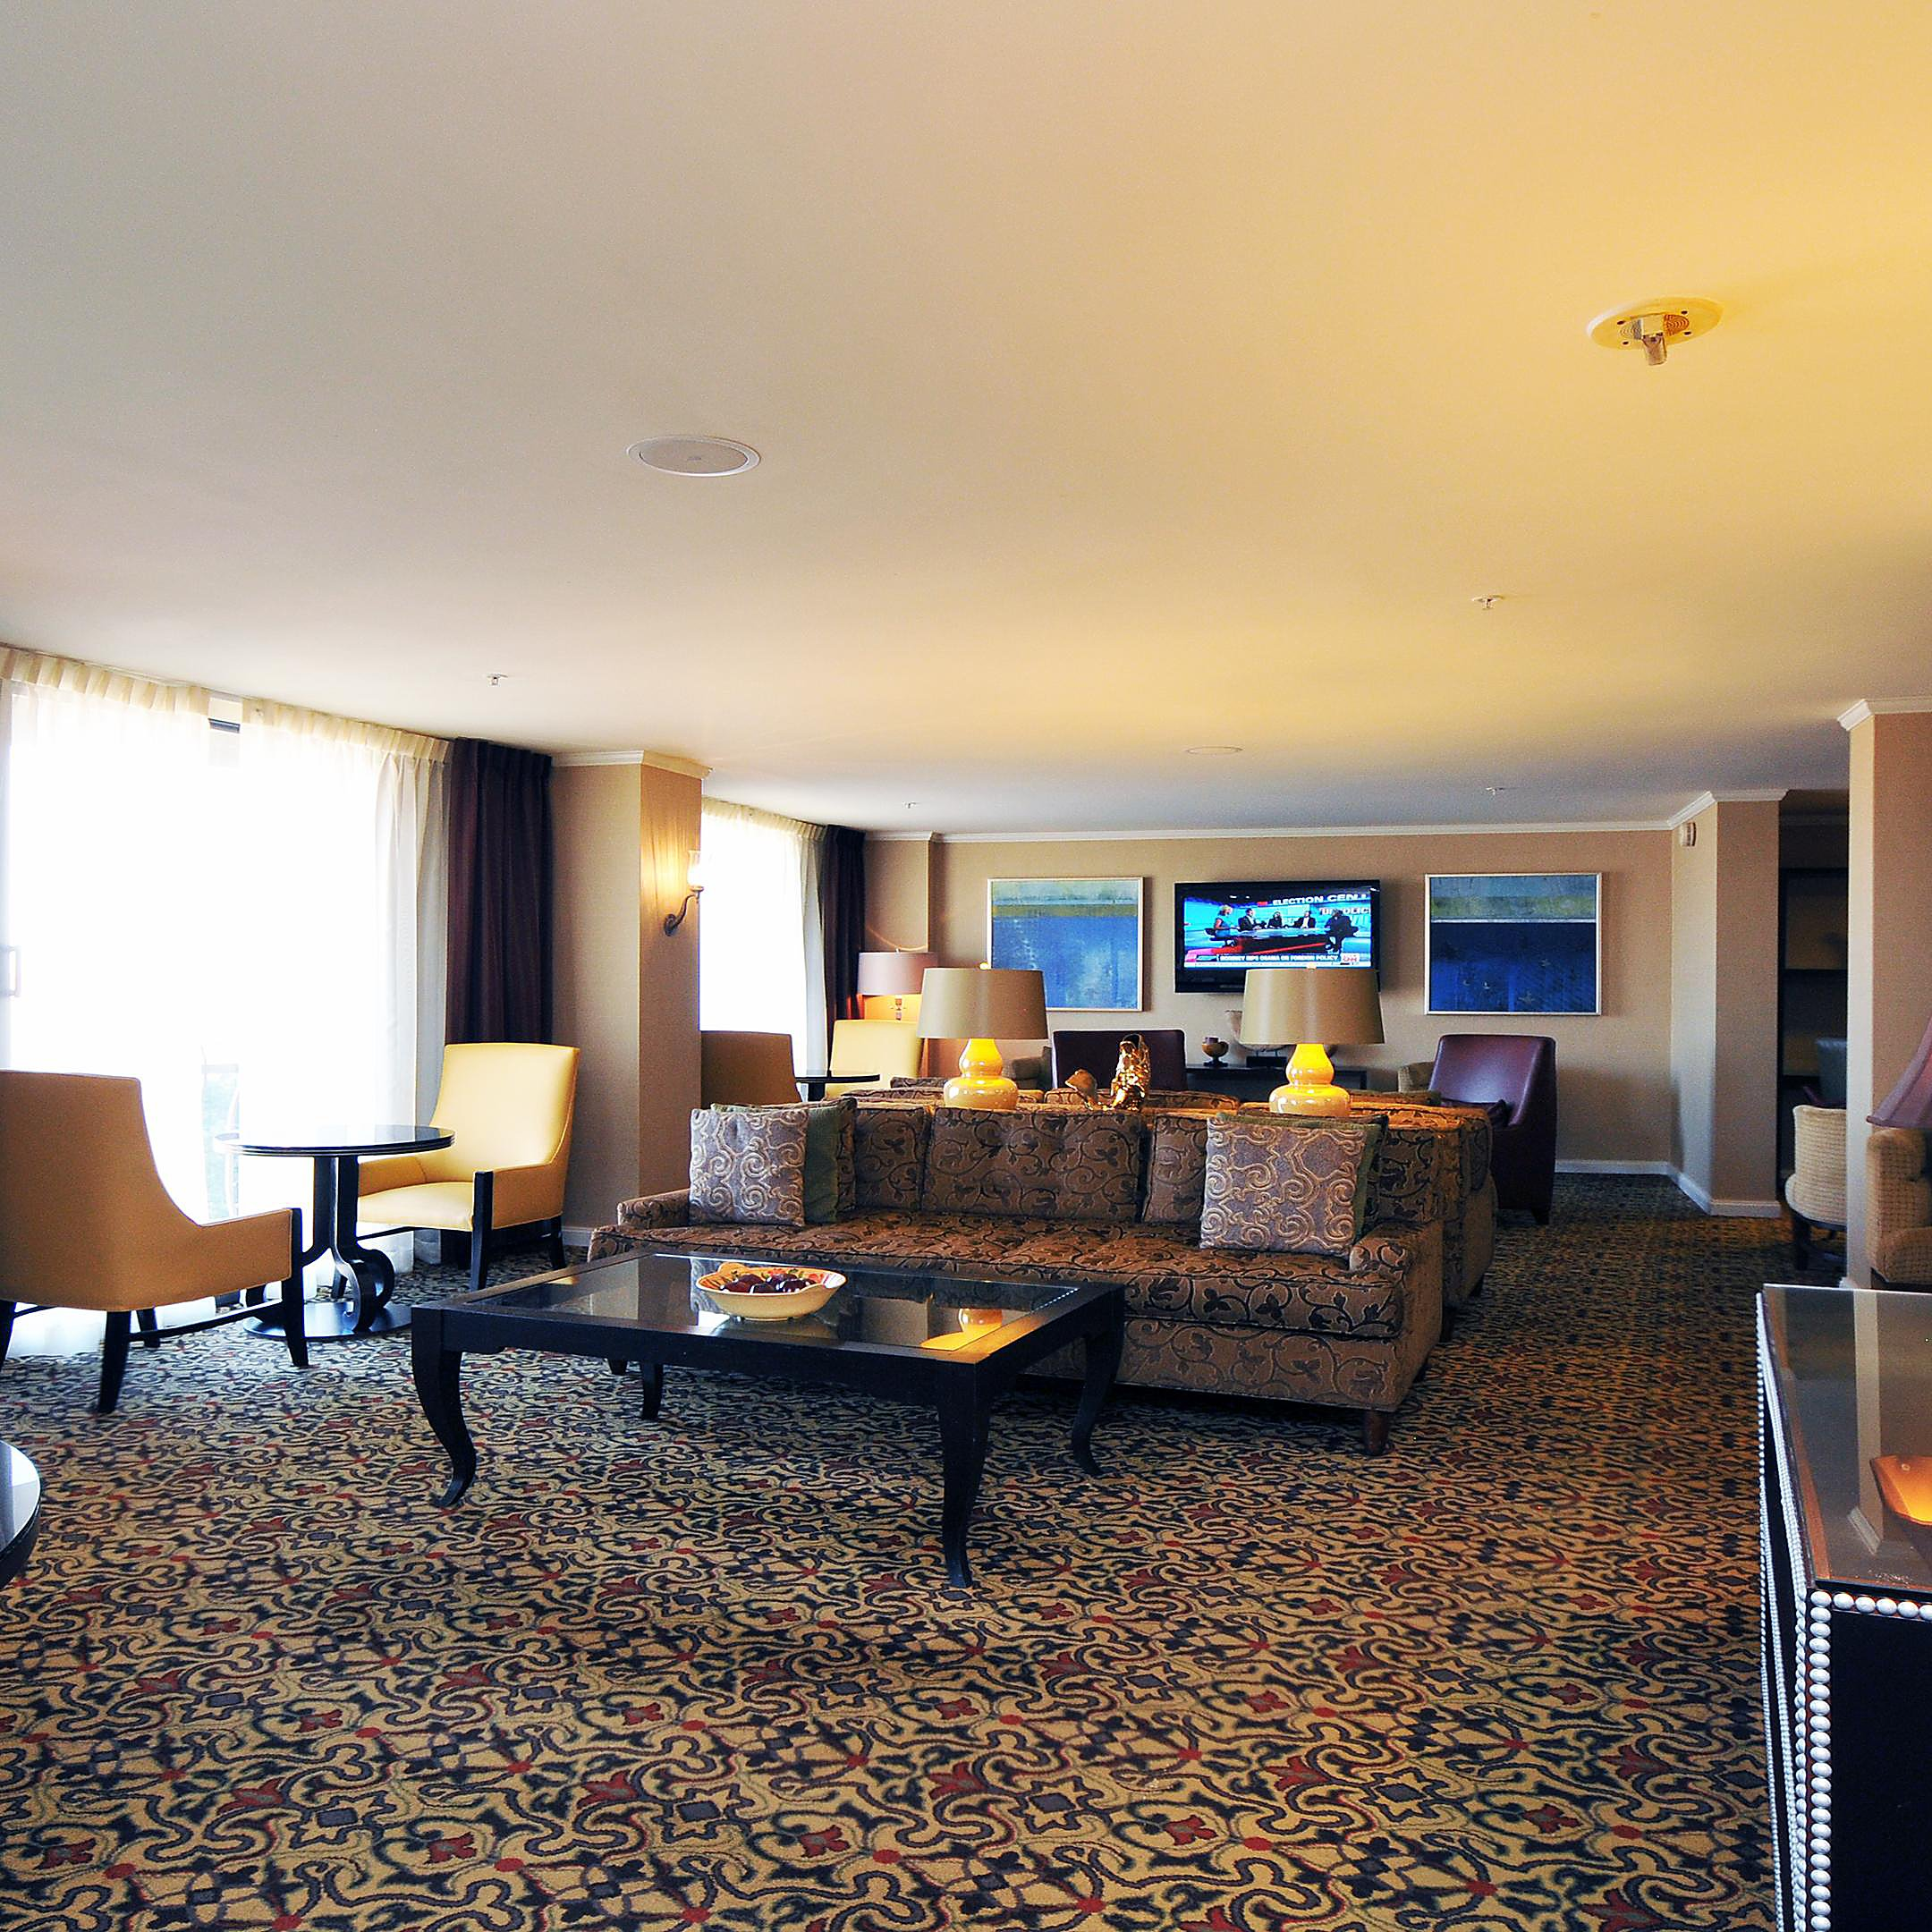 Kansas City Hotels: InterContinental Kansas City At The Plaza Hotel